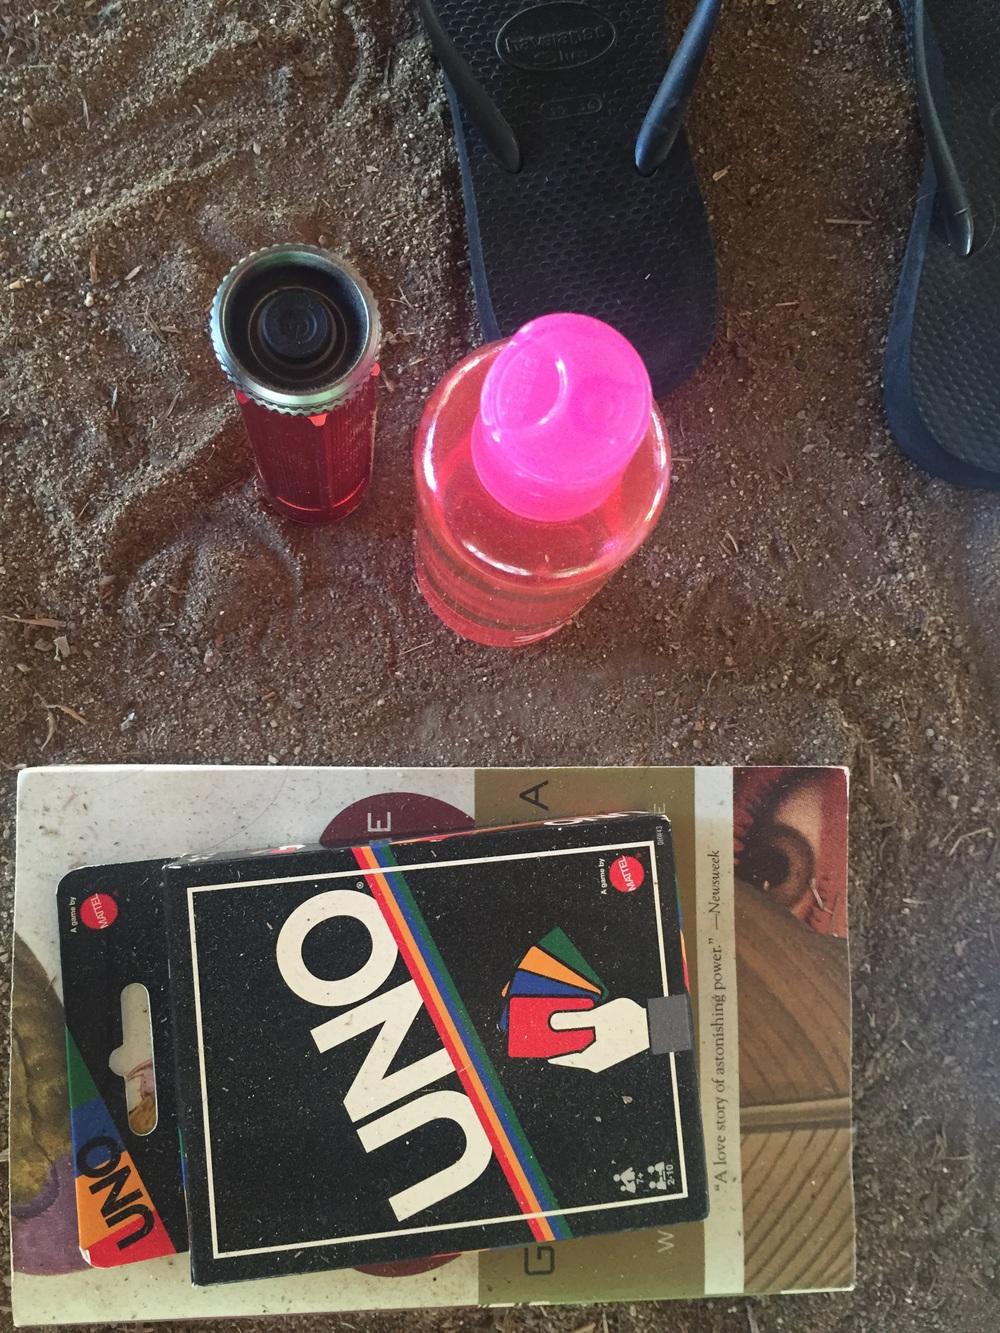 Deserted beach necessities; Uno, Gabriel Garcia Marquez, Haivainas, flashlight, and coconut oil